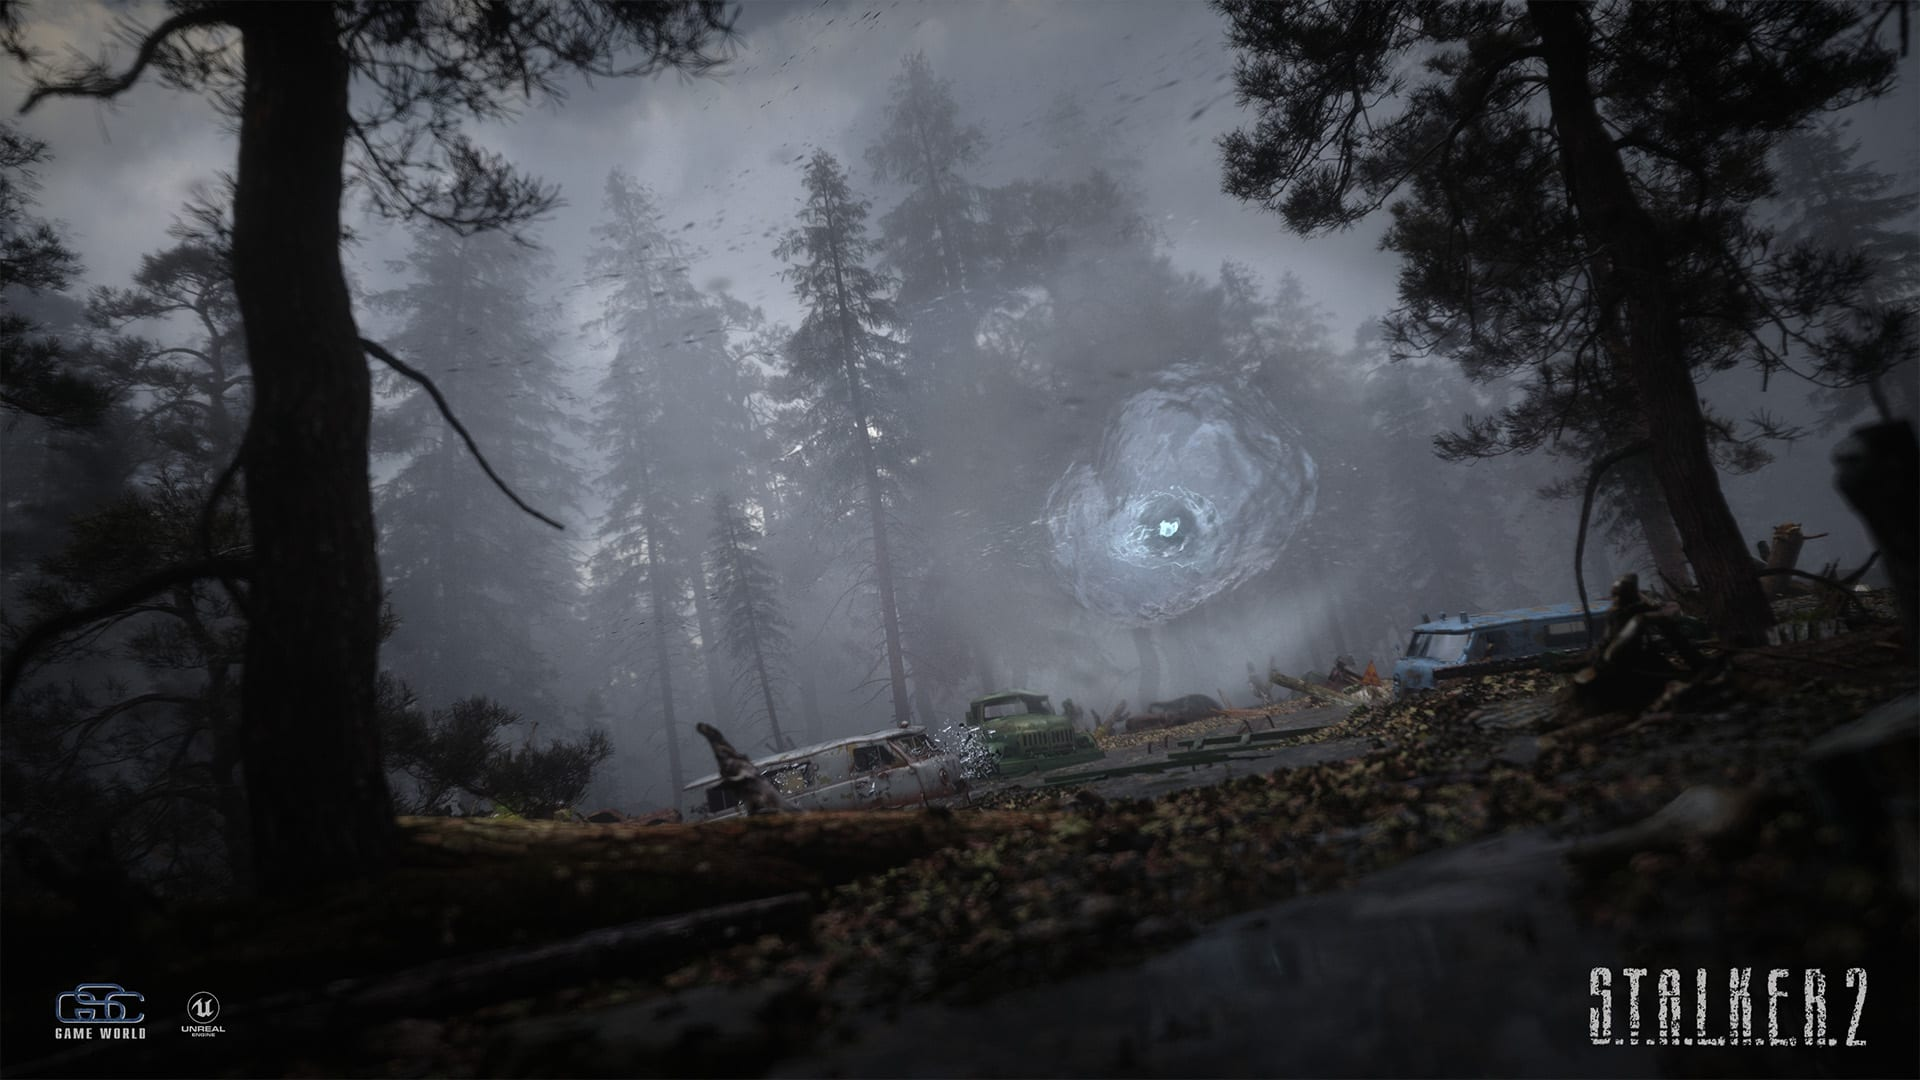 Stalker 2 Bild Welt